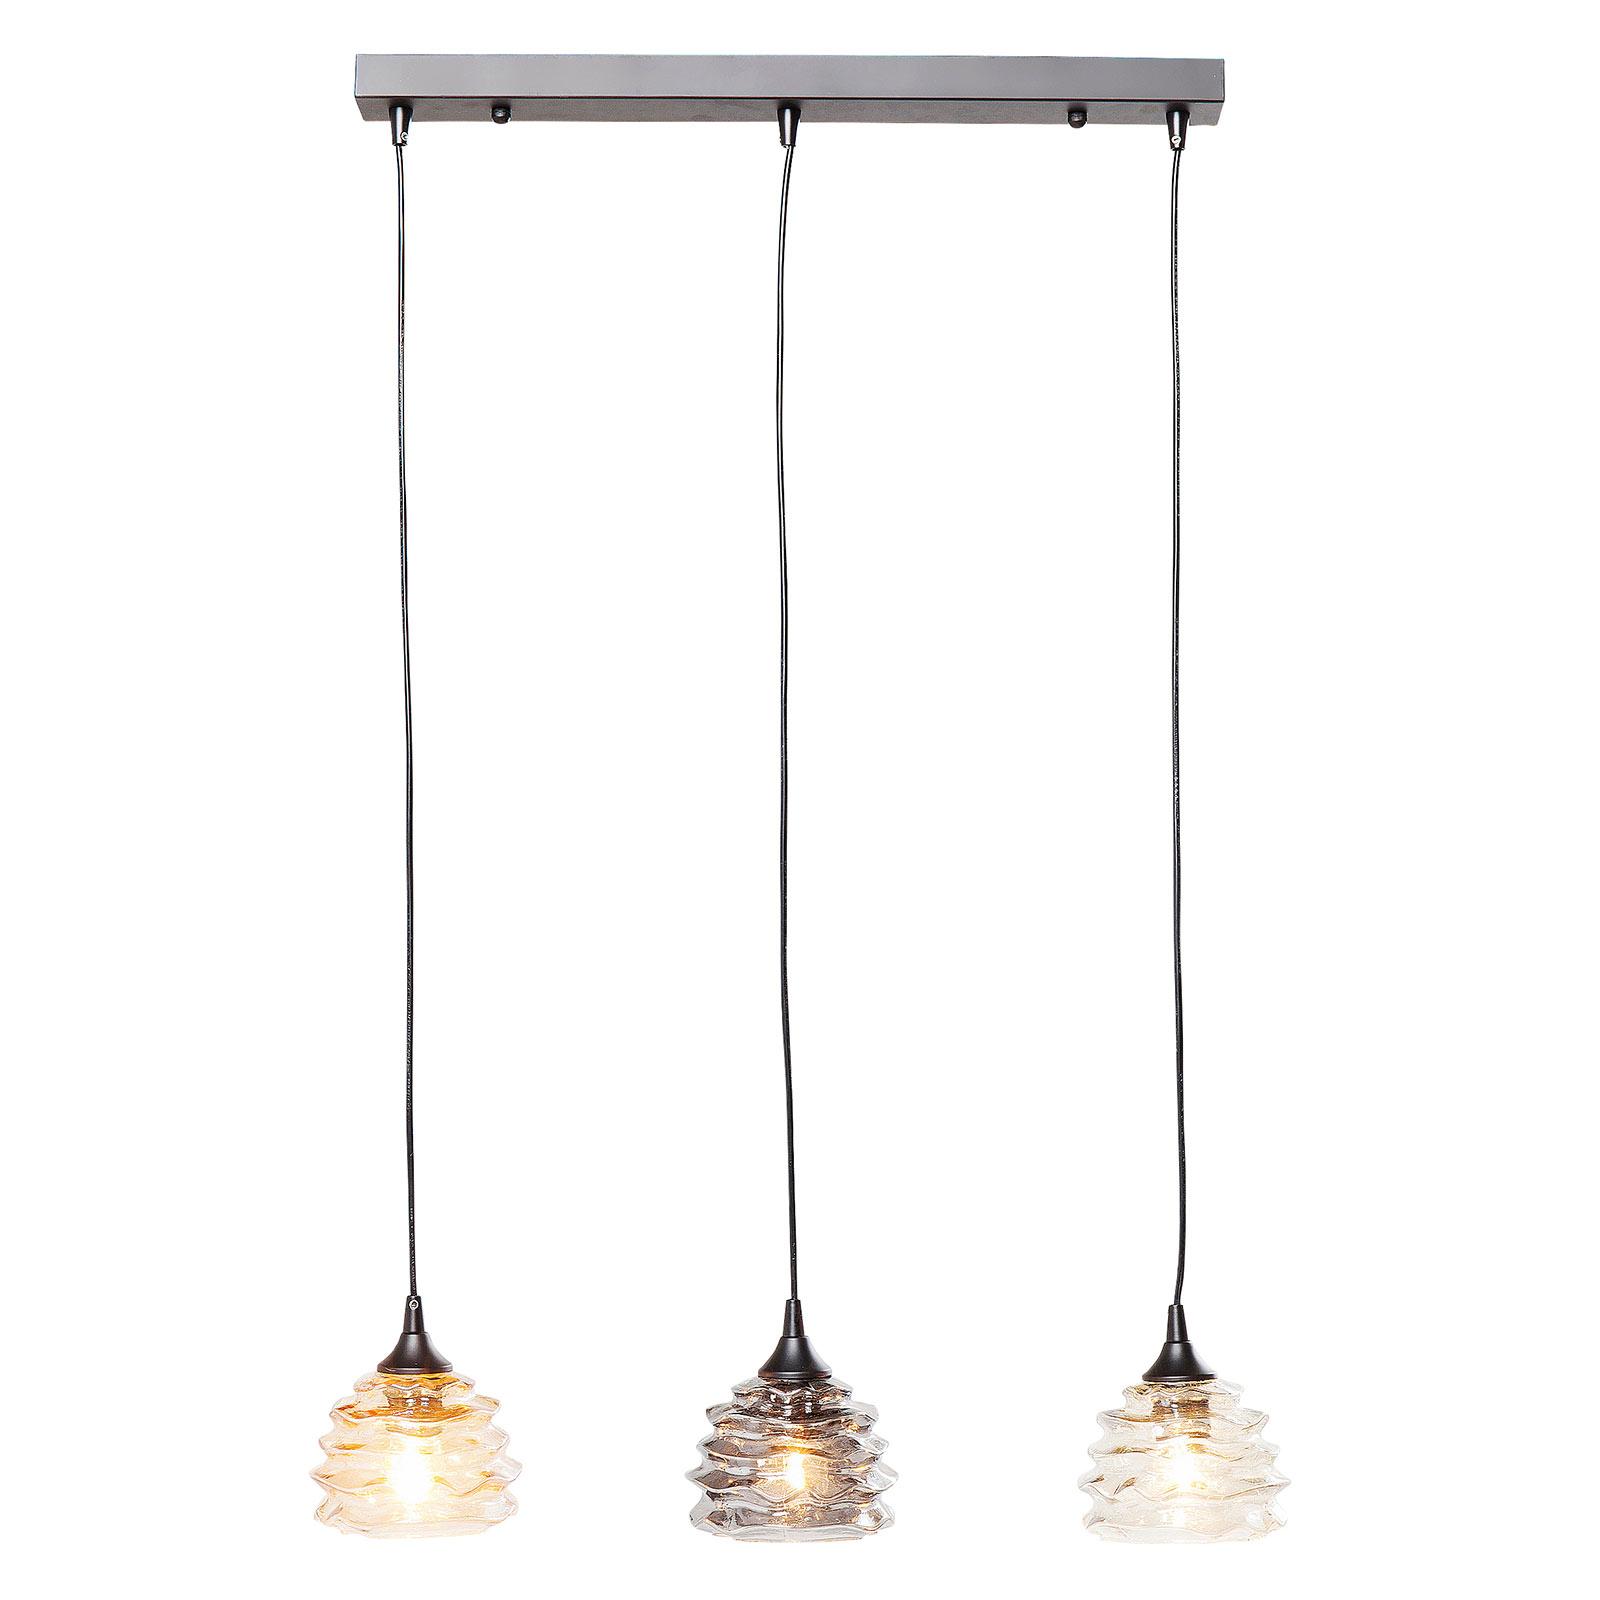 KARE Ruffle Dining Visible hanglamp lang 3-lamps